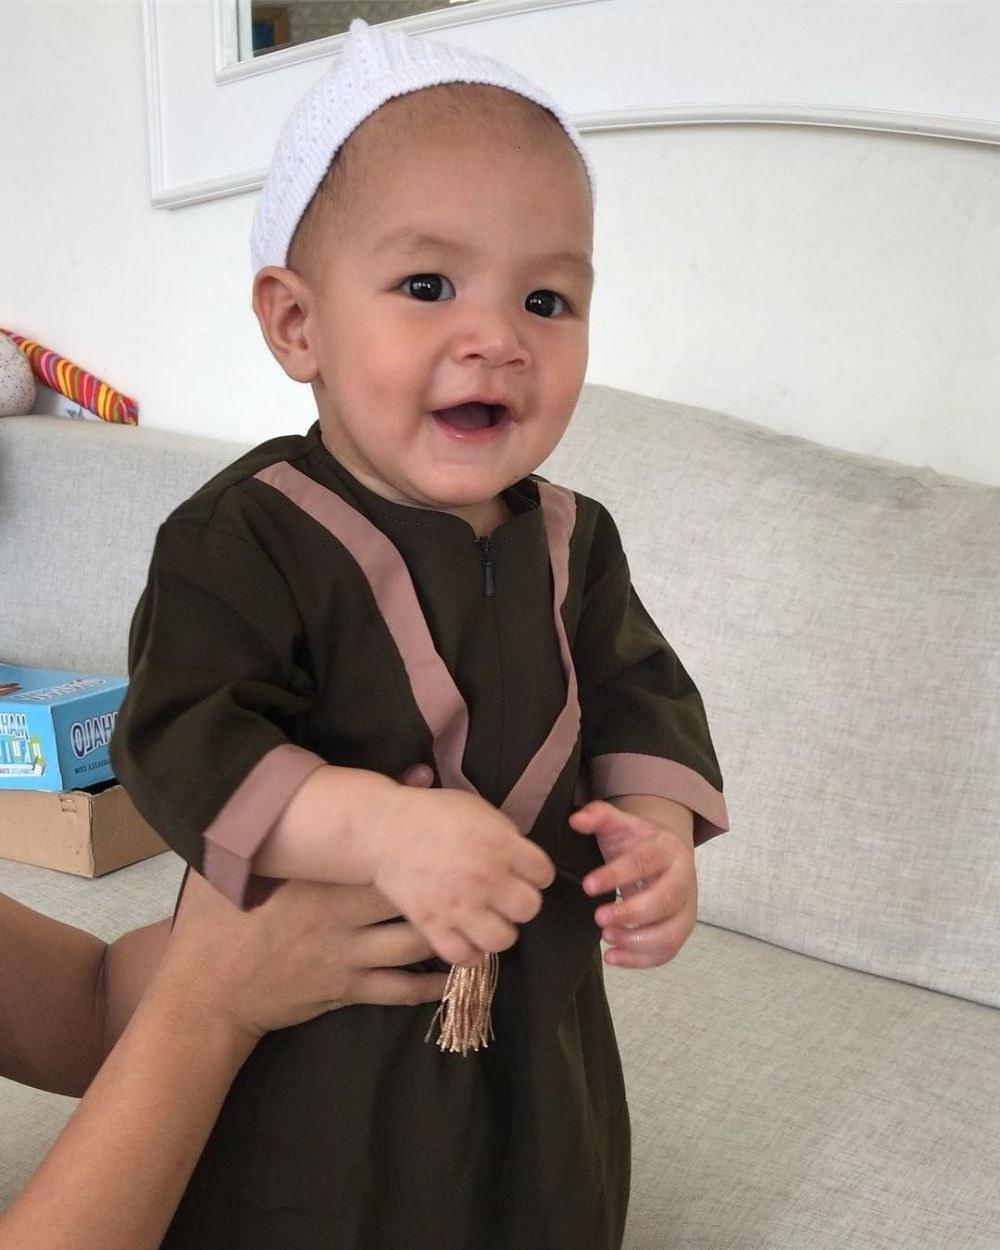 Bentuk Baju Lebaran Ipdd 10 Inspirasi Baju Lebaran Anak Seleb Modis Dan Stylish